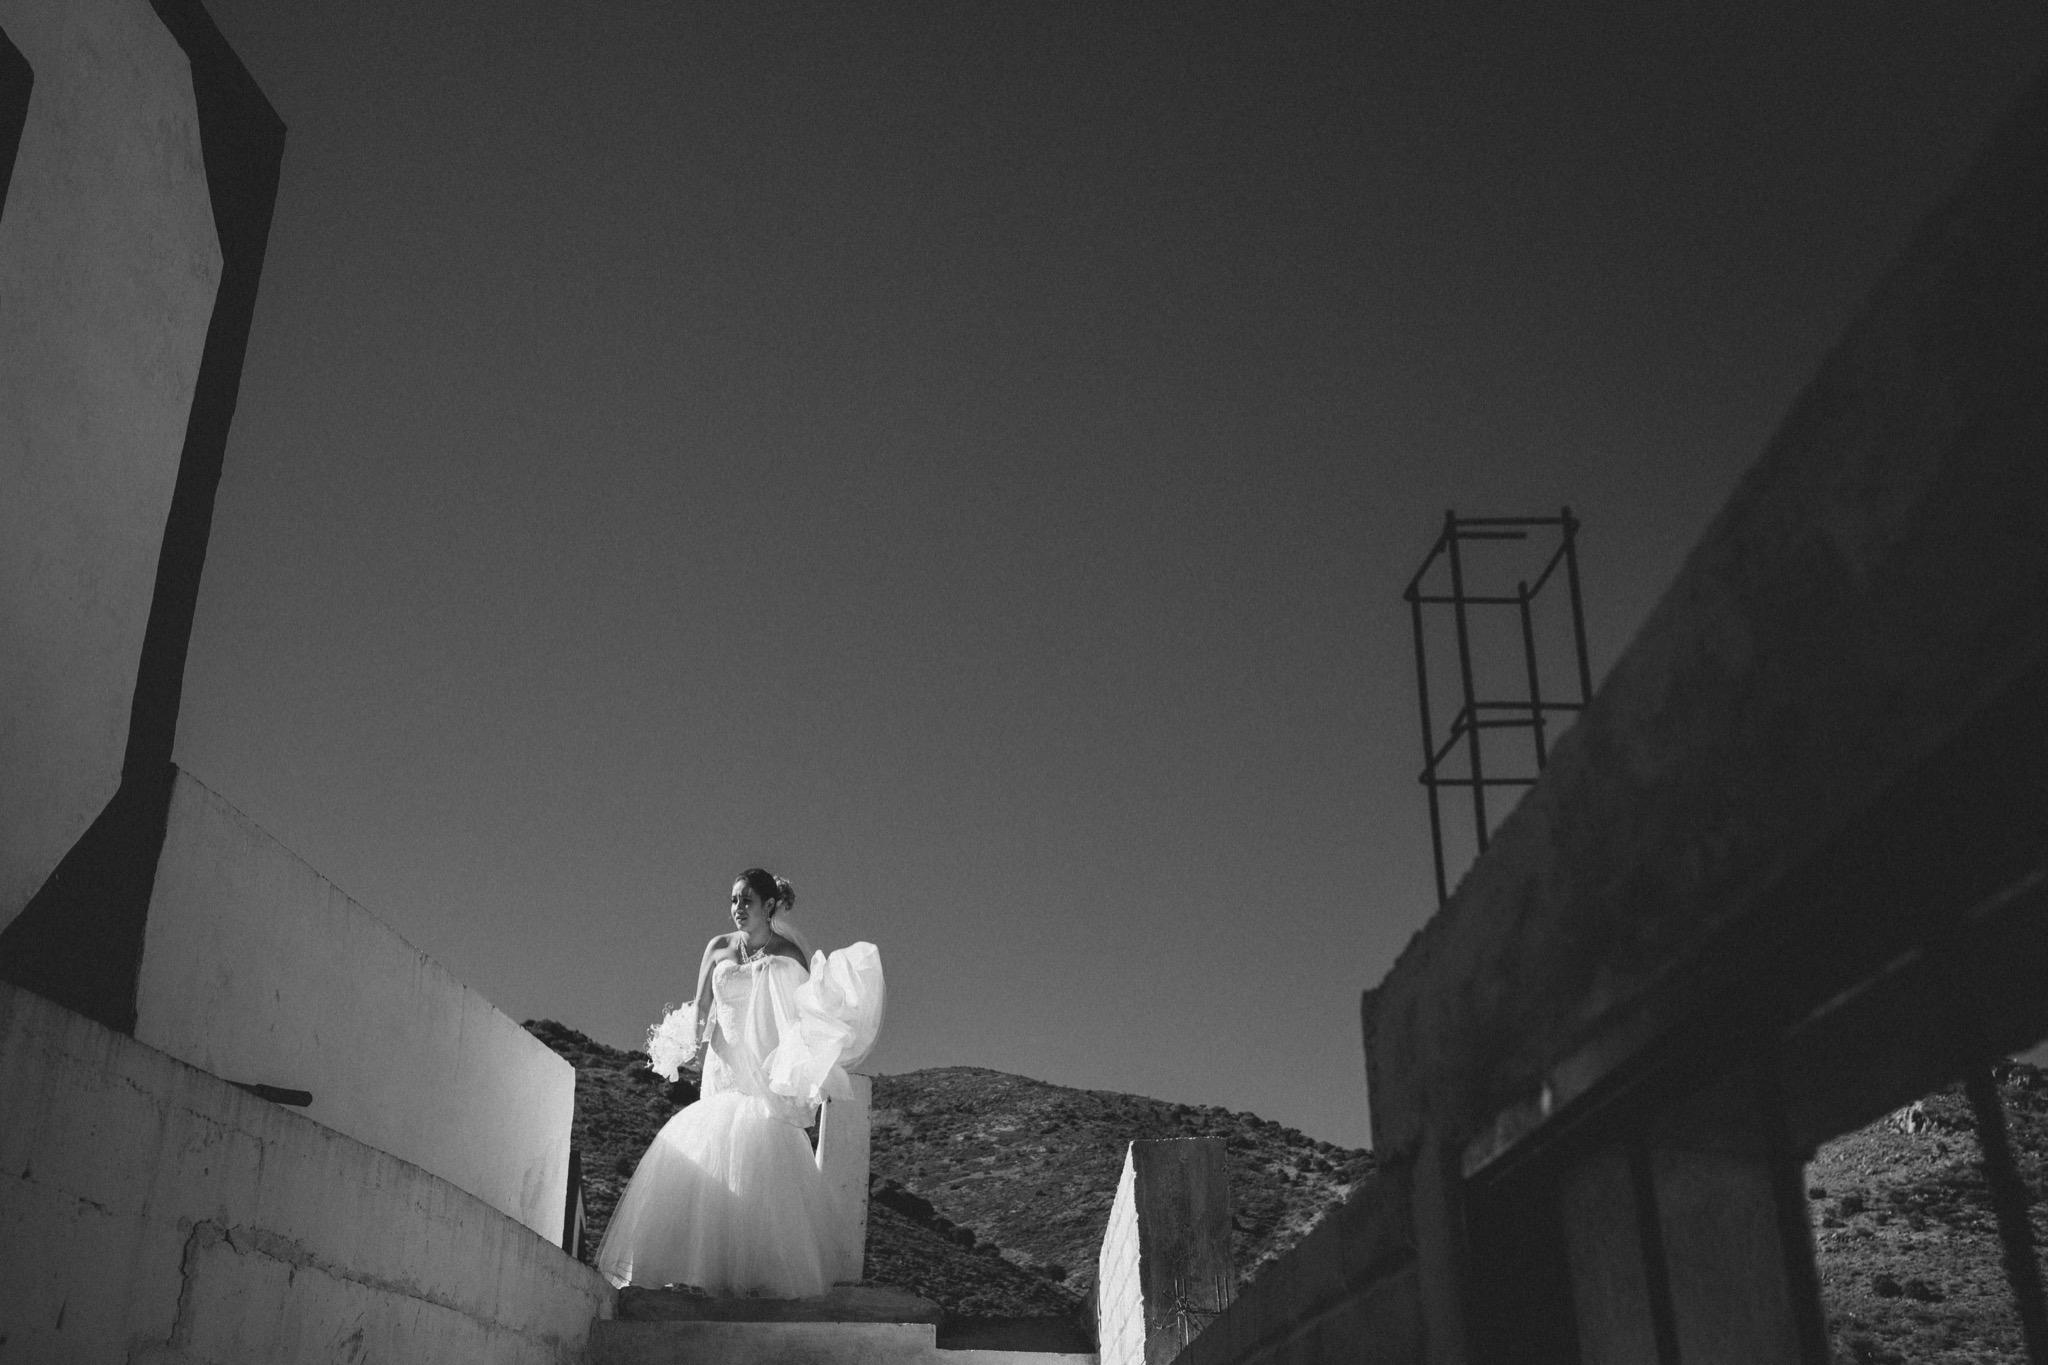 javier_noriega_fotografo_profesional_bodas_zacatecas_mexico_chihuahua_photographer_09